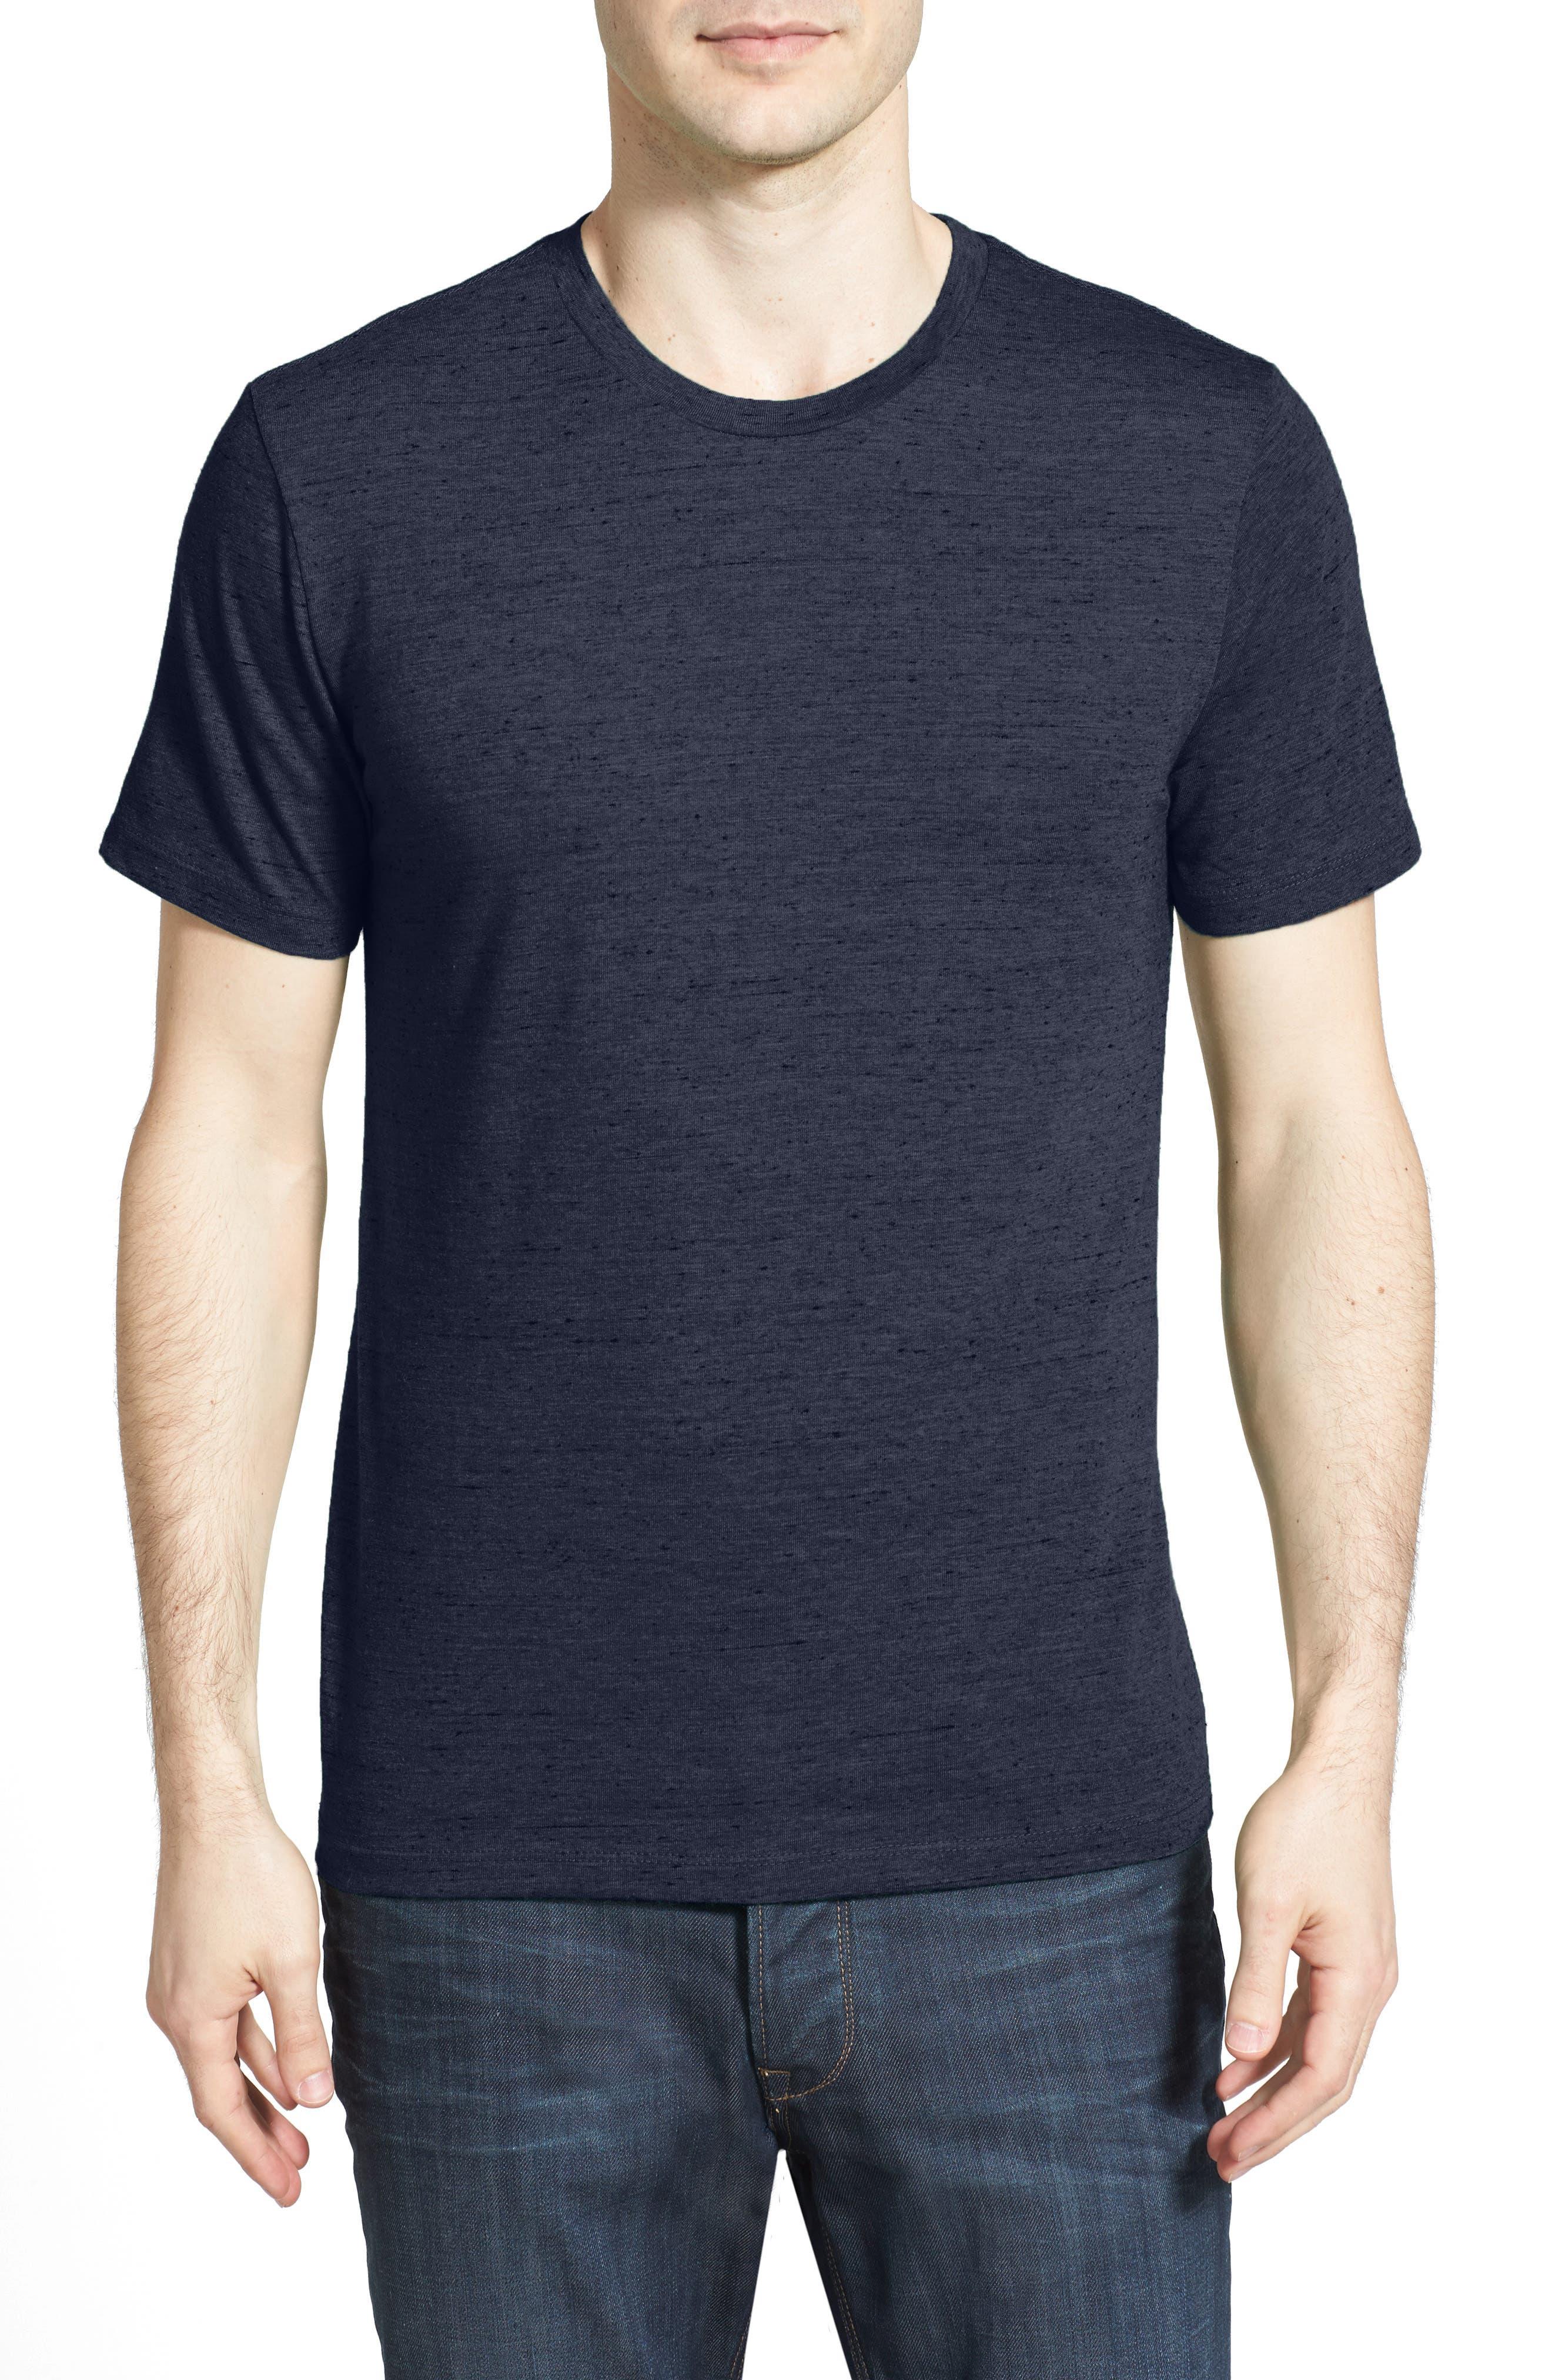 The Rail Slim Fit Crewneck T-Shirt (2 for $30)